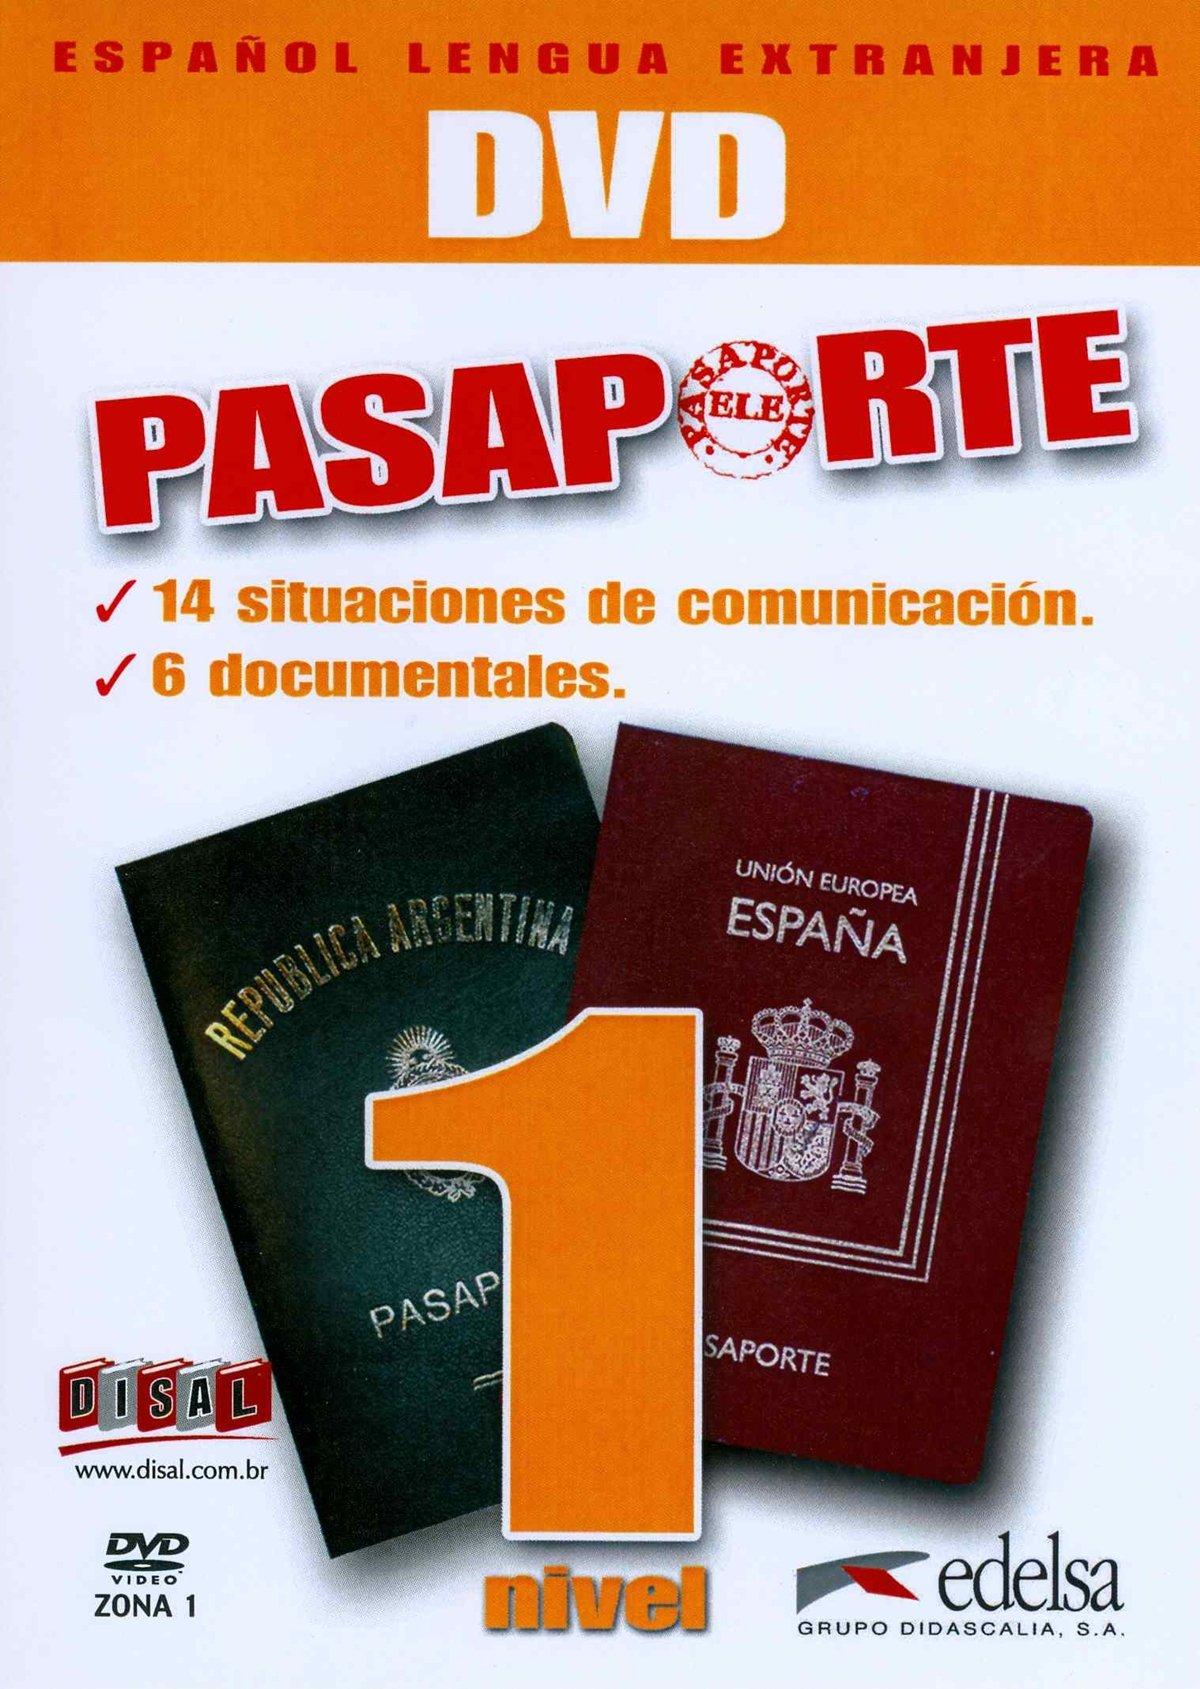 Pasaporte Ele. A1. Per le Scuole superiori. DVD-ROM: Amazon.es: Cerrolaza, Óscar, Llovet, Begona, Cerrolaza, Matilde: Libros en idiomas extranjeros